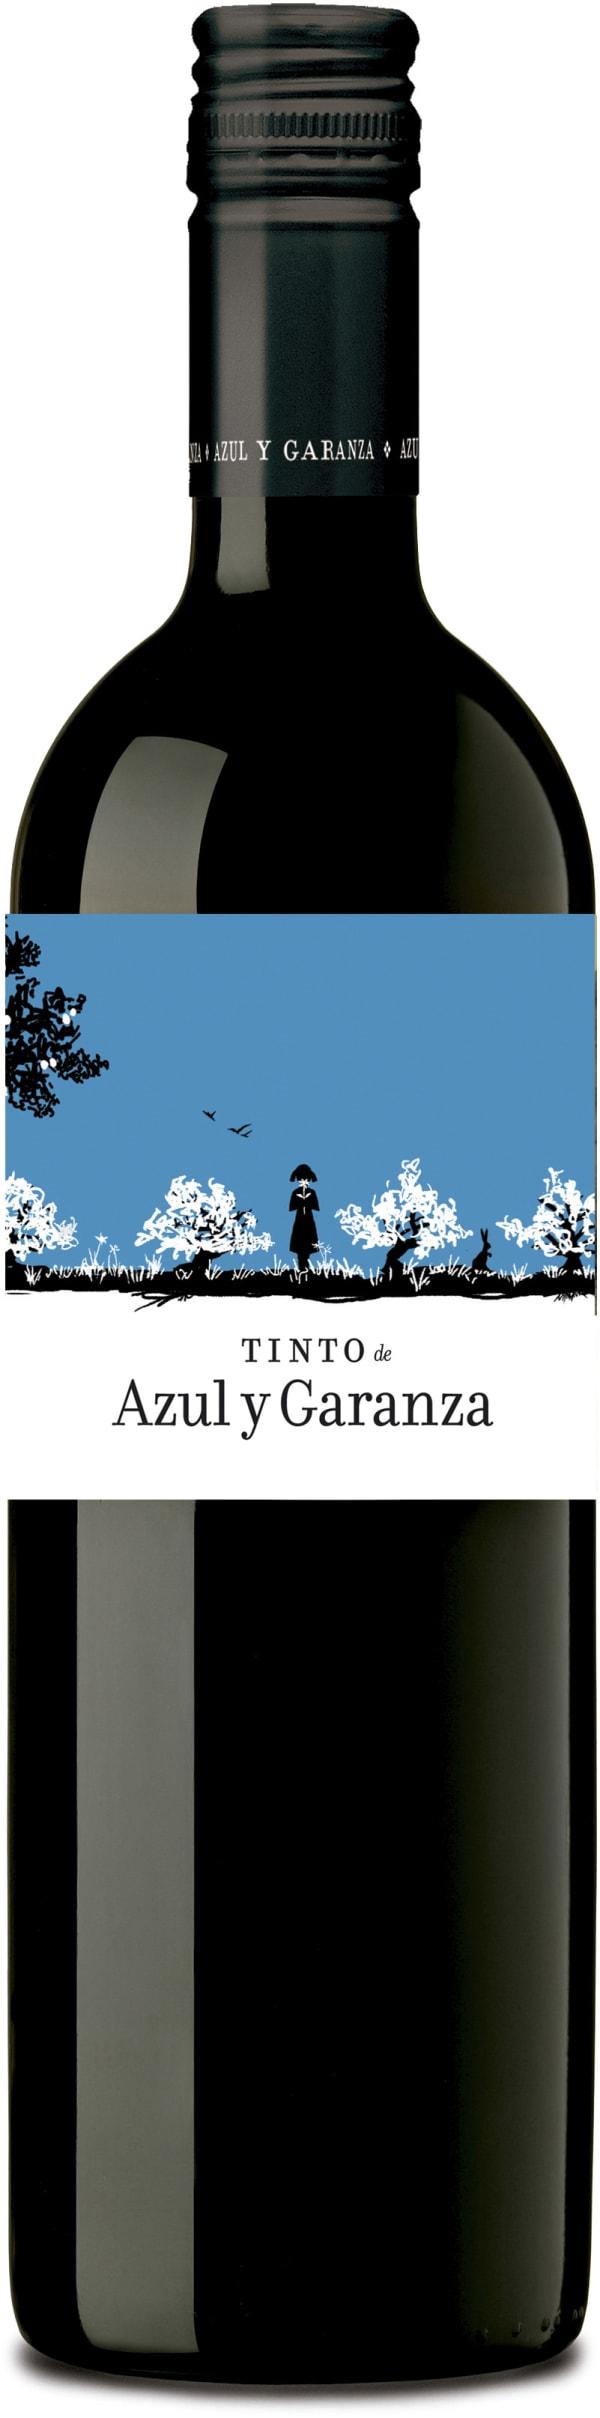 Azul y Garanza Tinto 2018